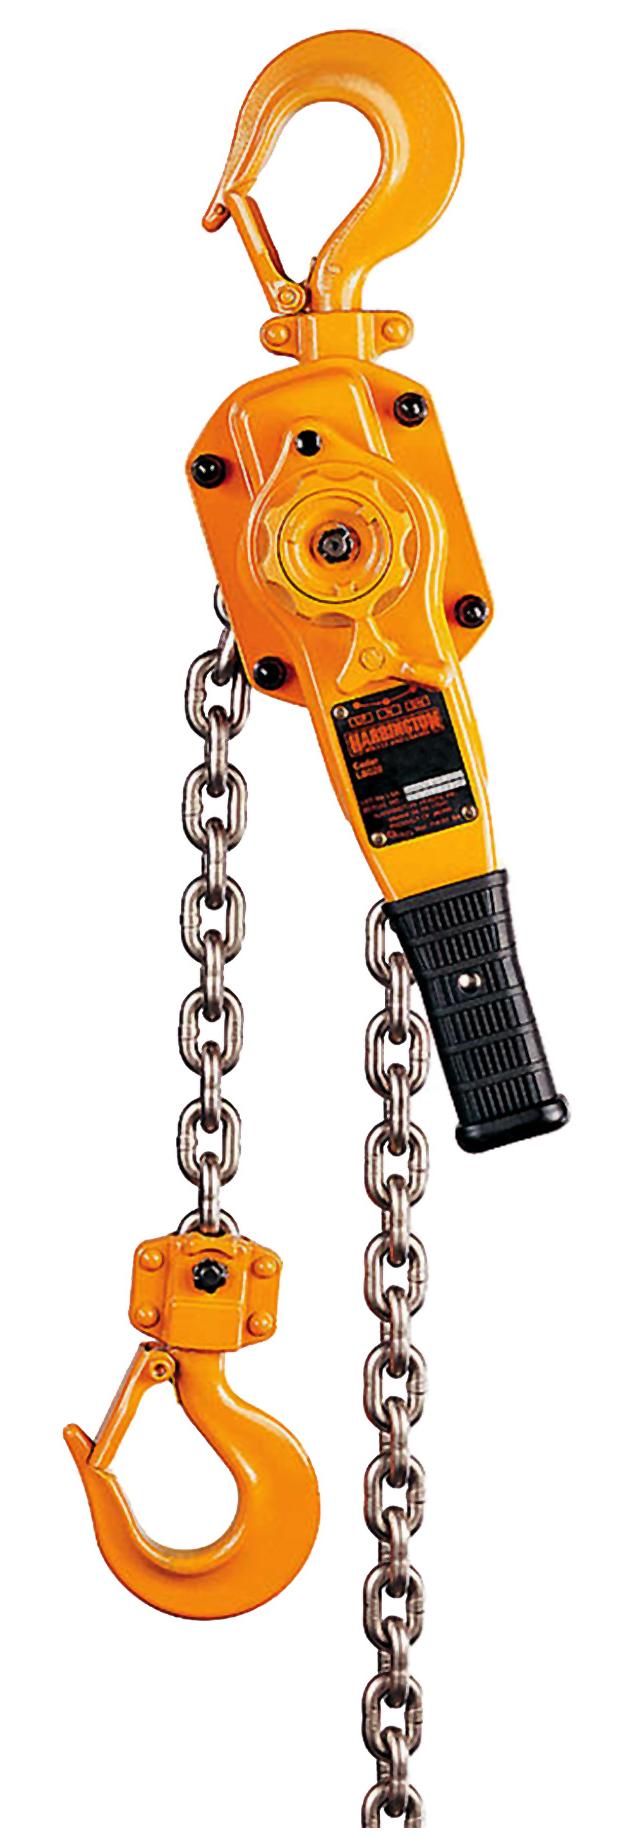 LCAL030 HARRINGTON Load Chain